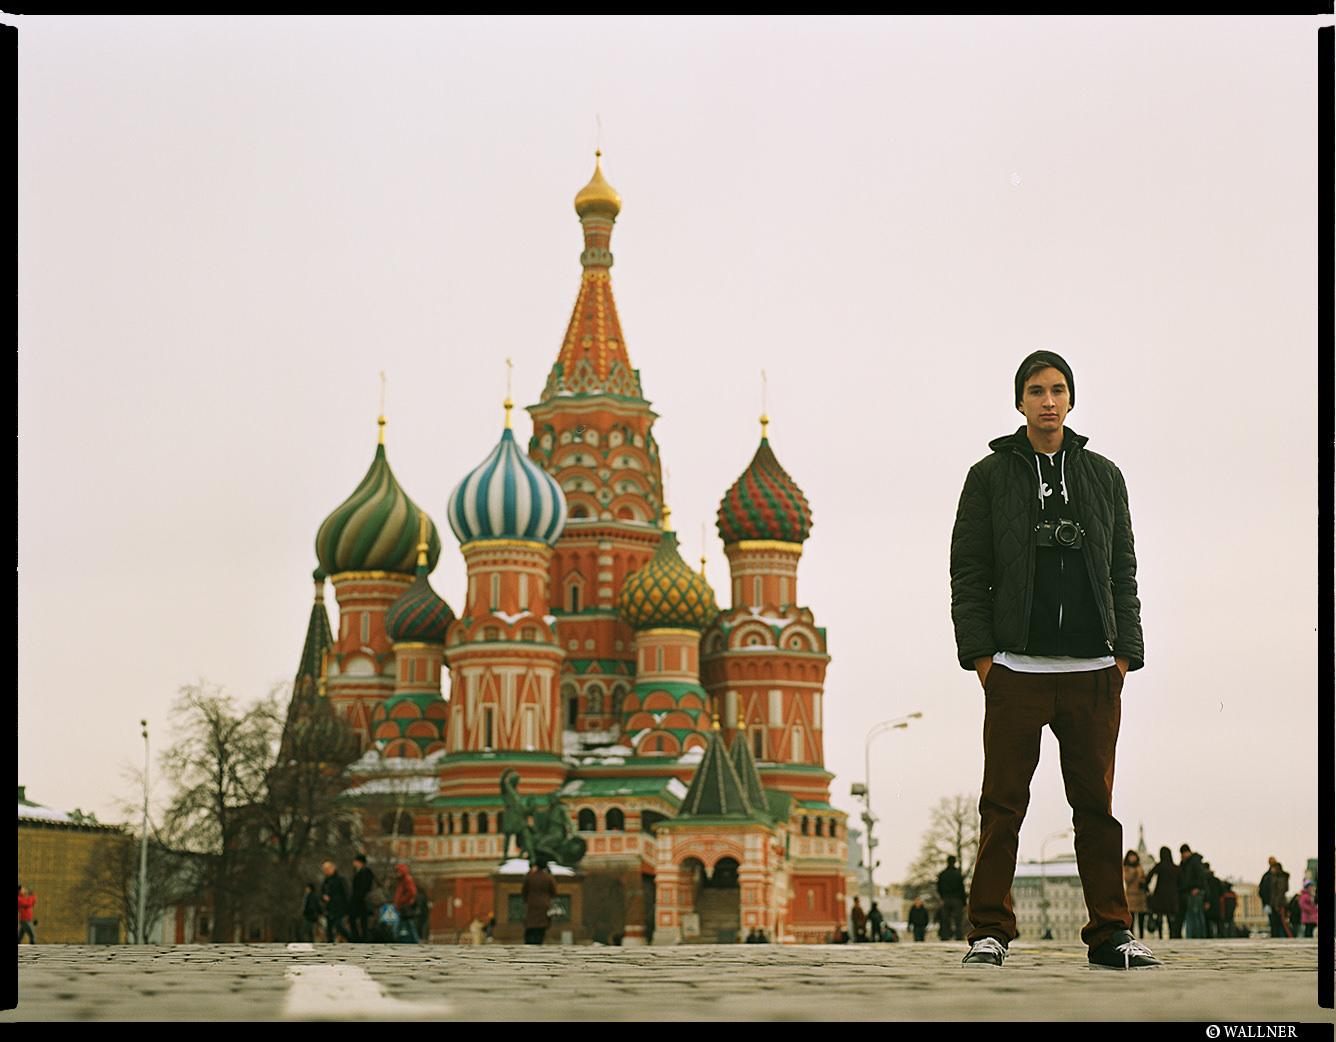 MediumFormatPatrikWallner_Moscow_RedTannerLOWQ